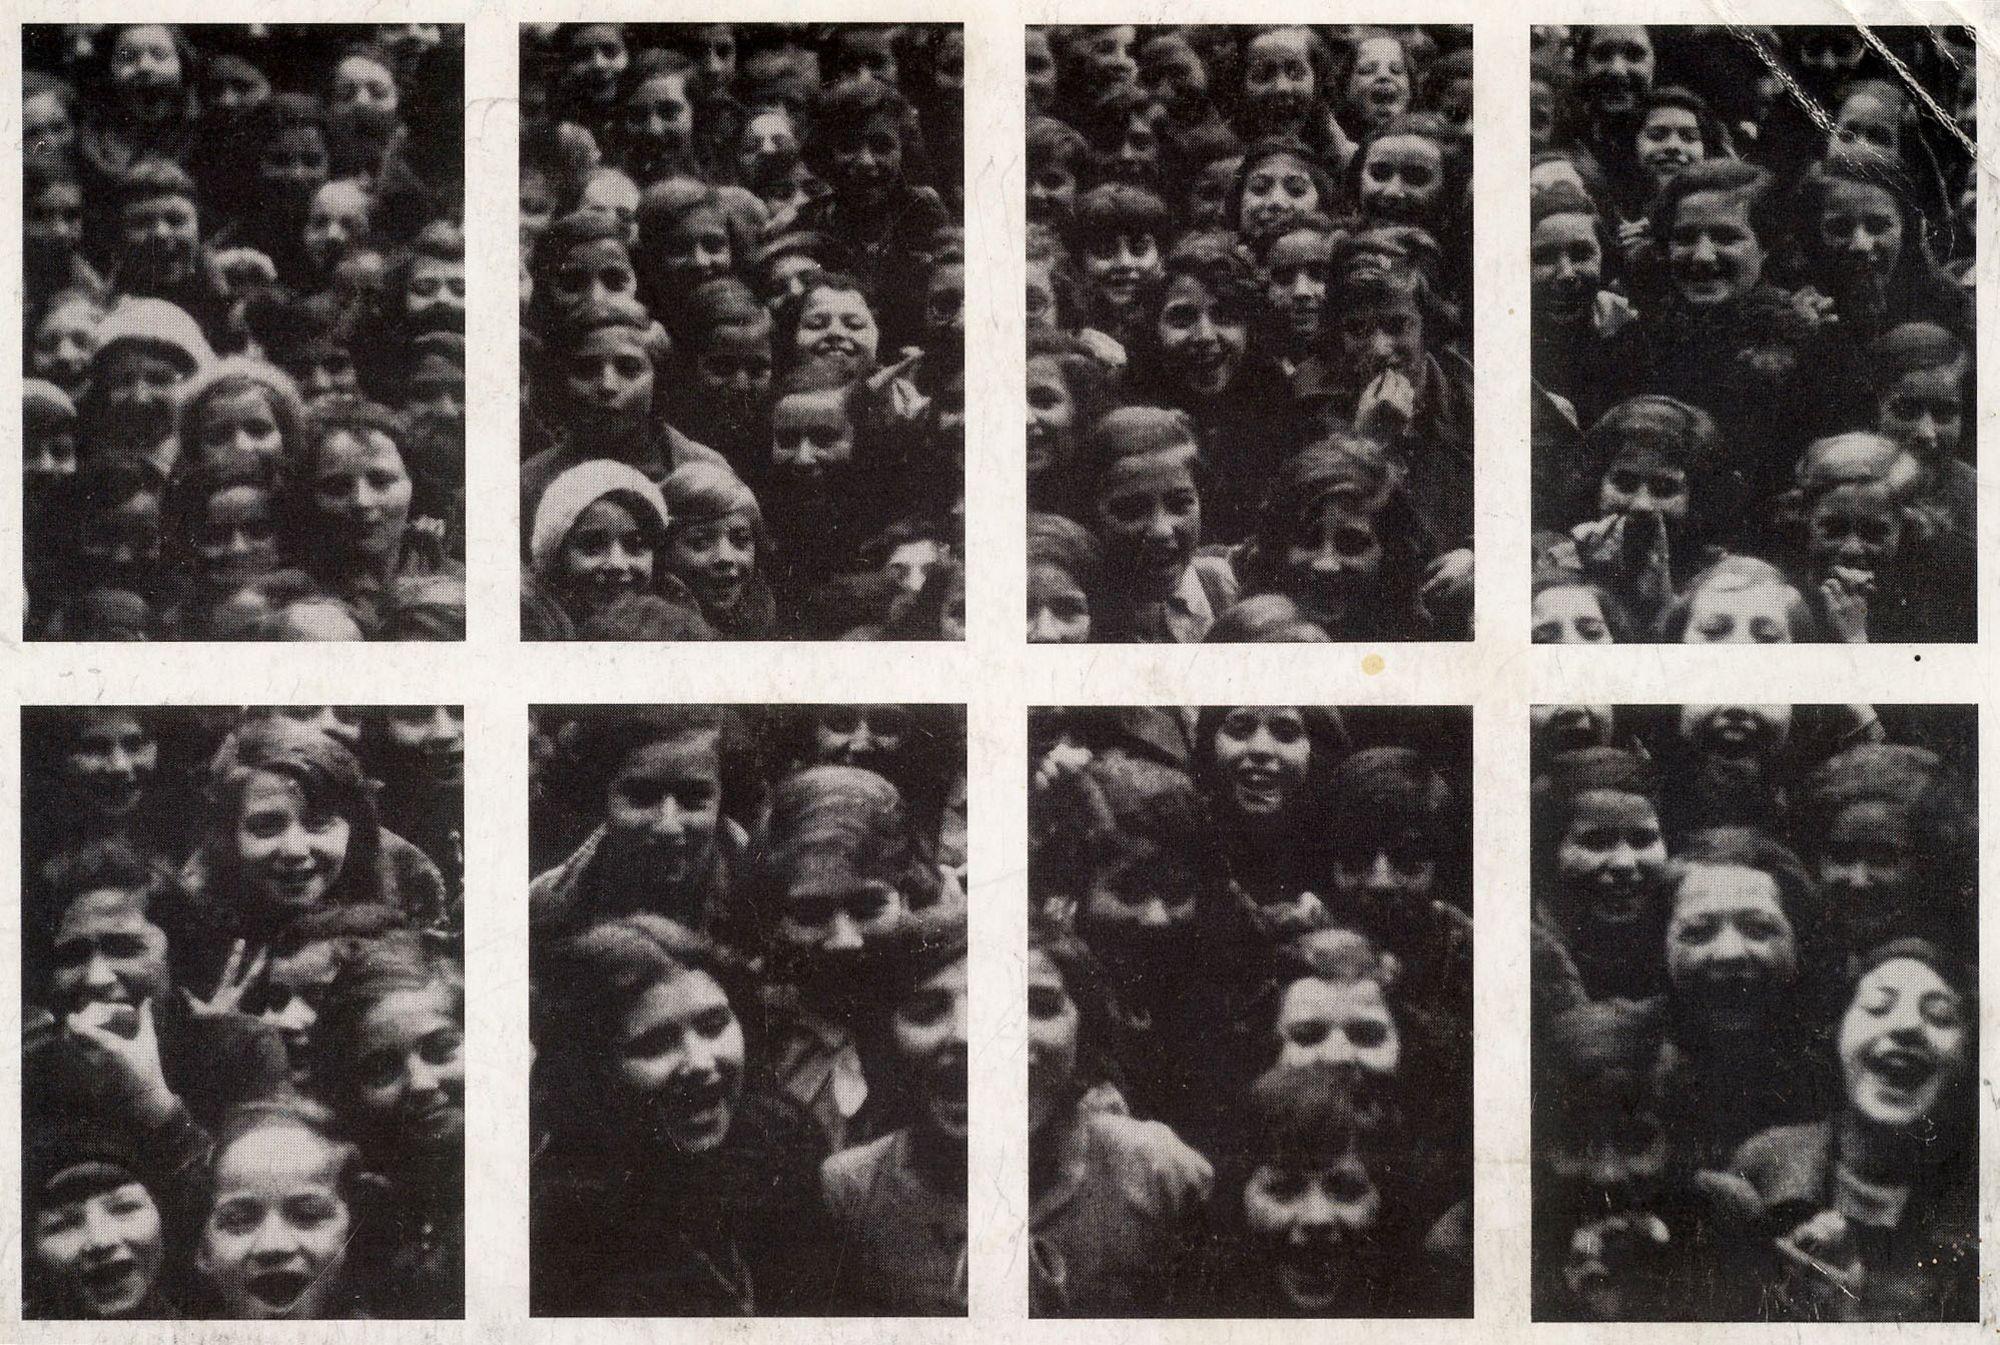 Lot 12 Christian Boltanski, The School of the Grosse Hamburgerstrasse, Berlin 1939 – Ticket price: 1.000 €